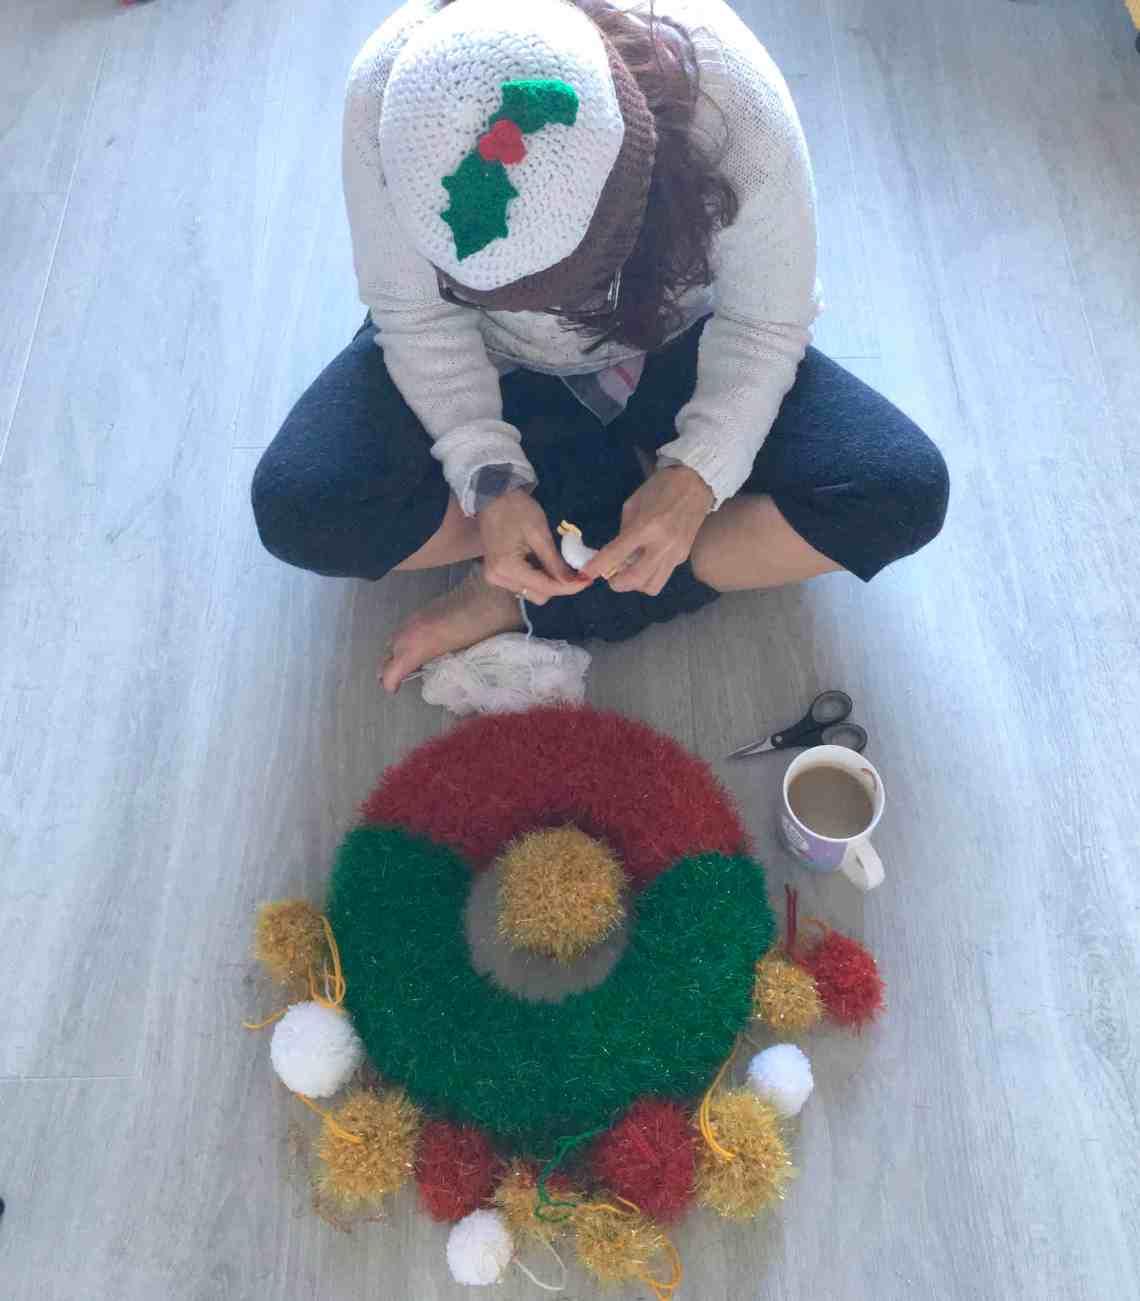 dora does making a festive christmas crochet tinsel wreath